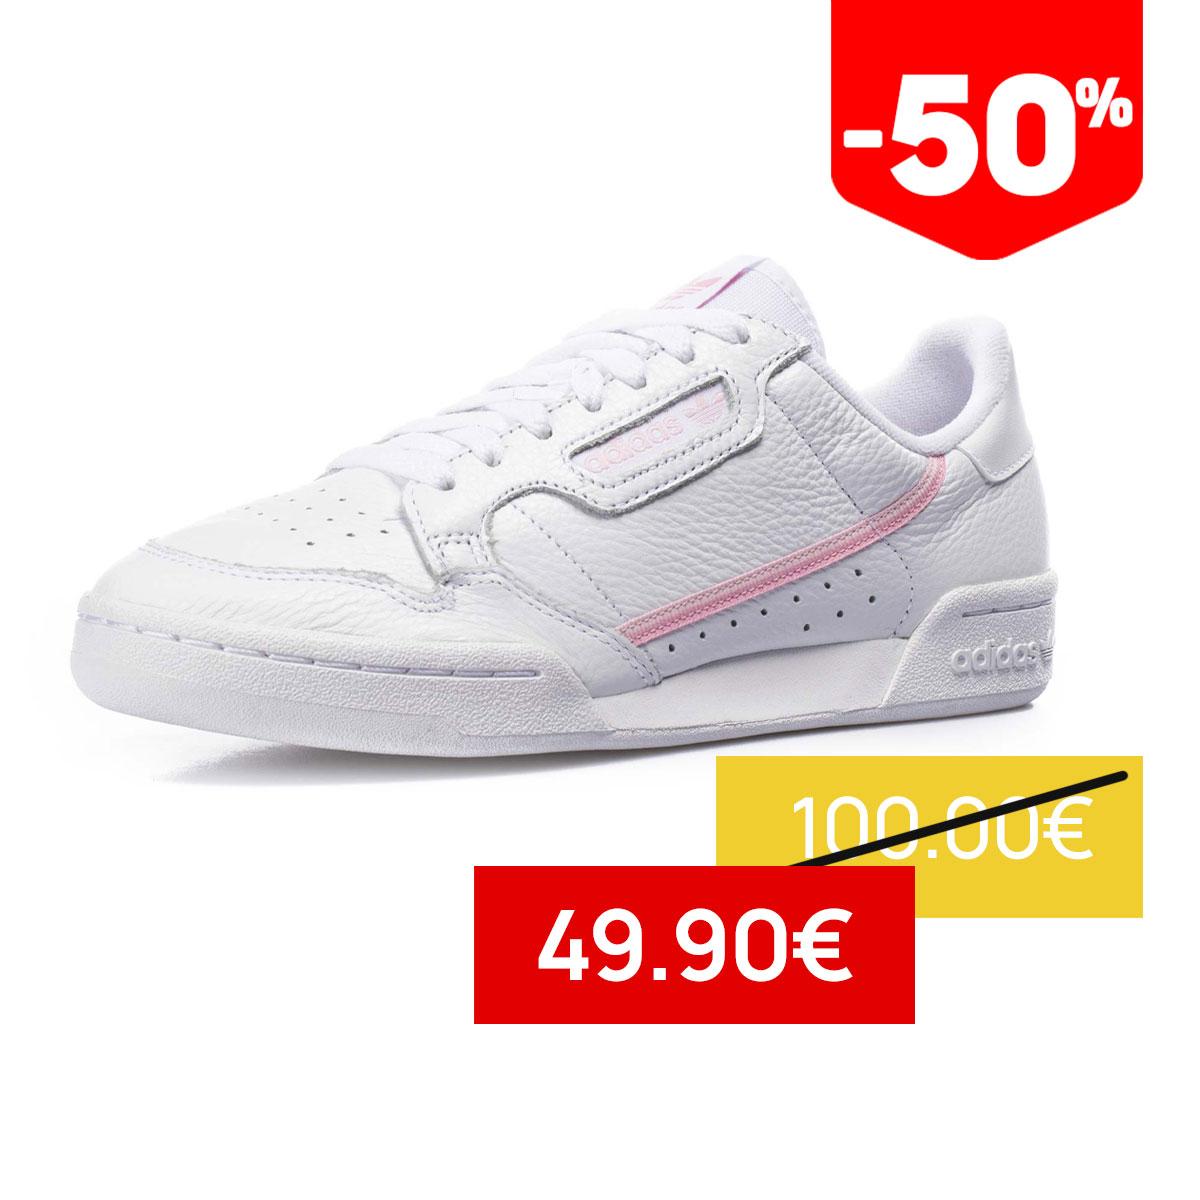 Adidas Originals -50%